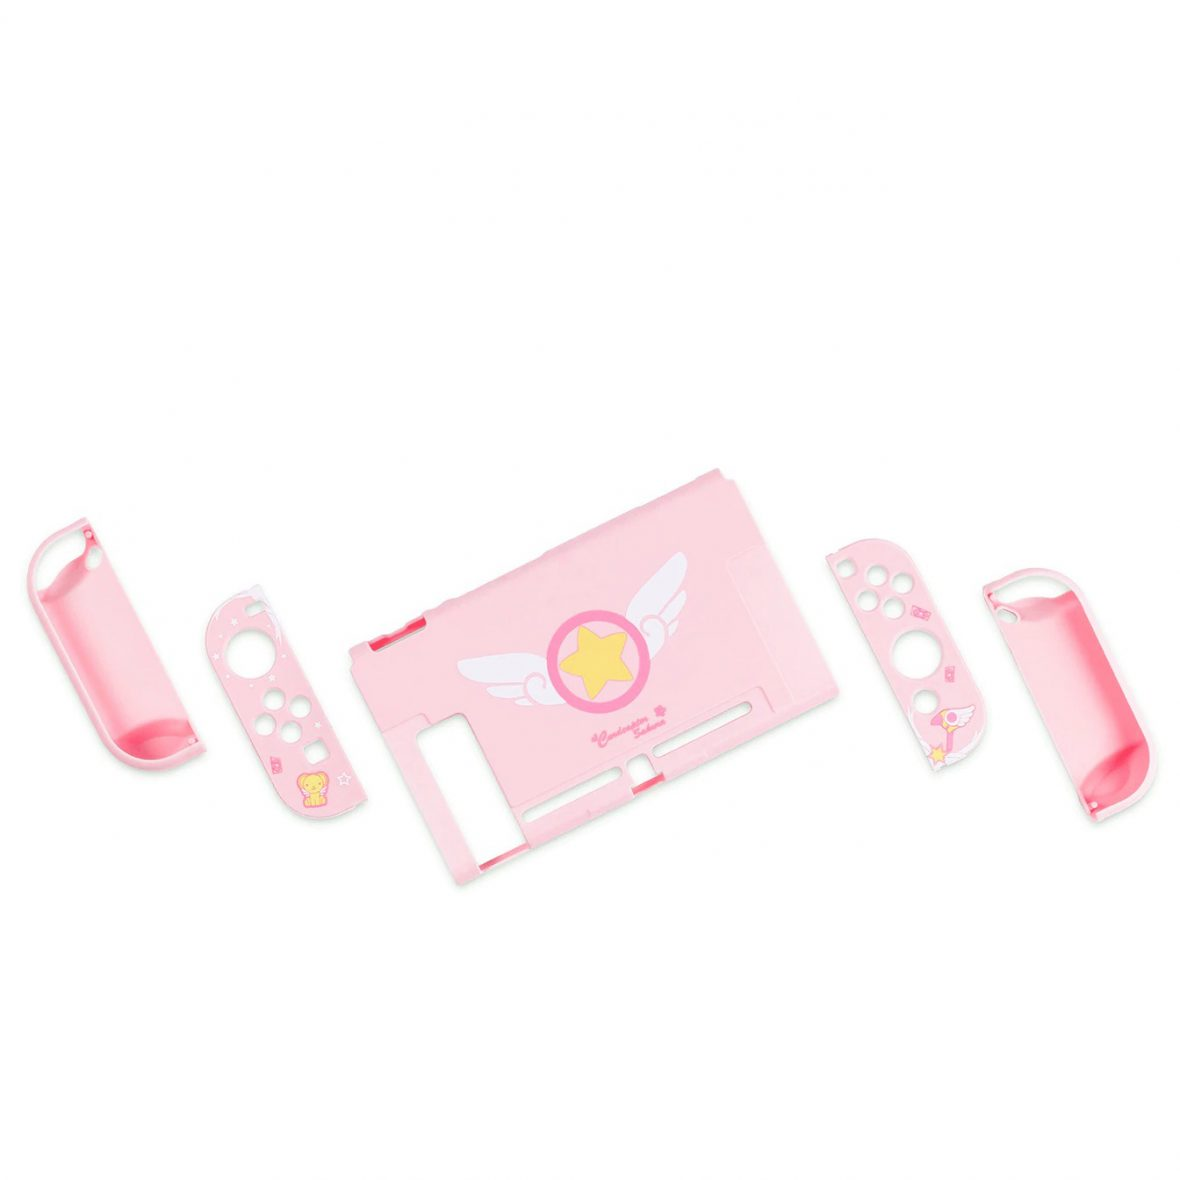 moncon-pink-girl-case-for-nintend-switch_description-2